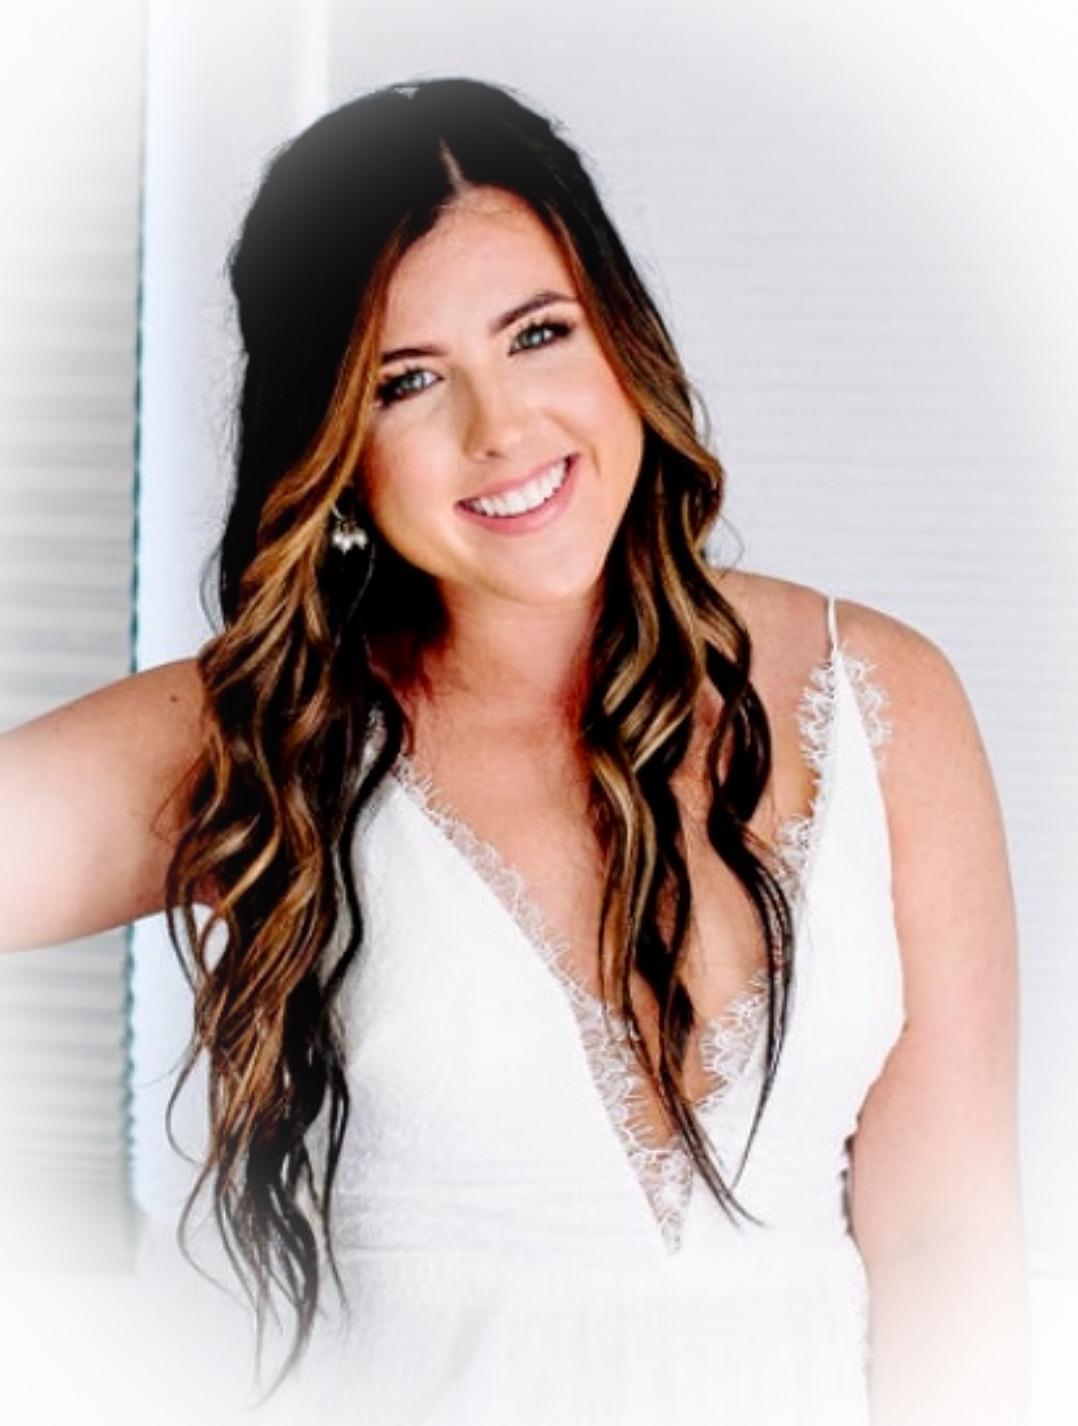 Hanna Jones, hairstylist, Thairapie hair salon, Southlake TX